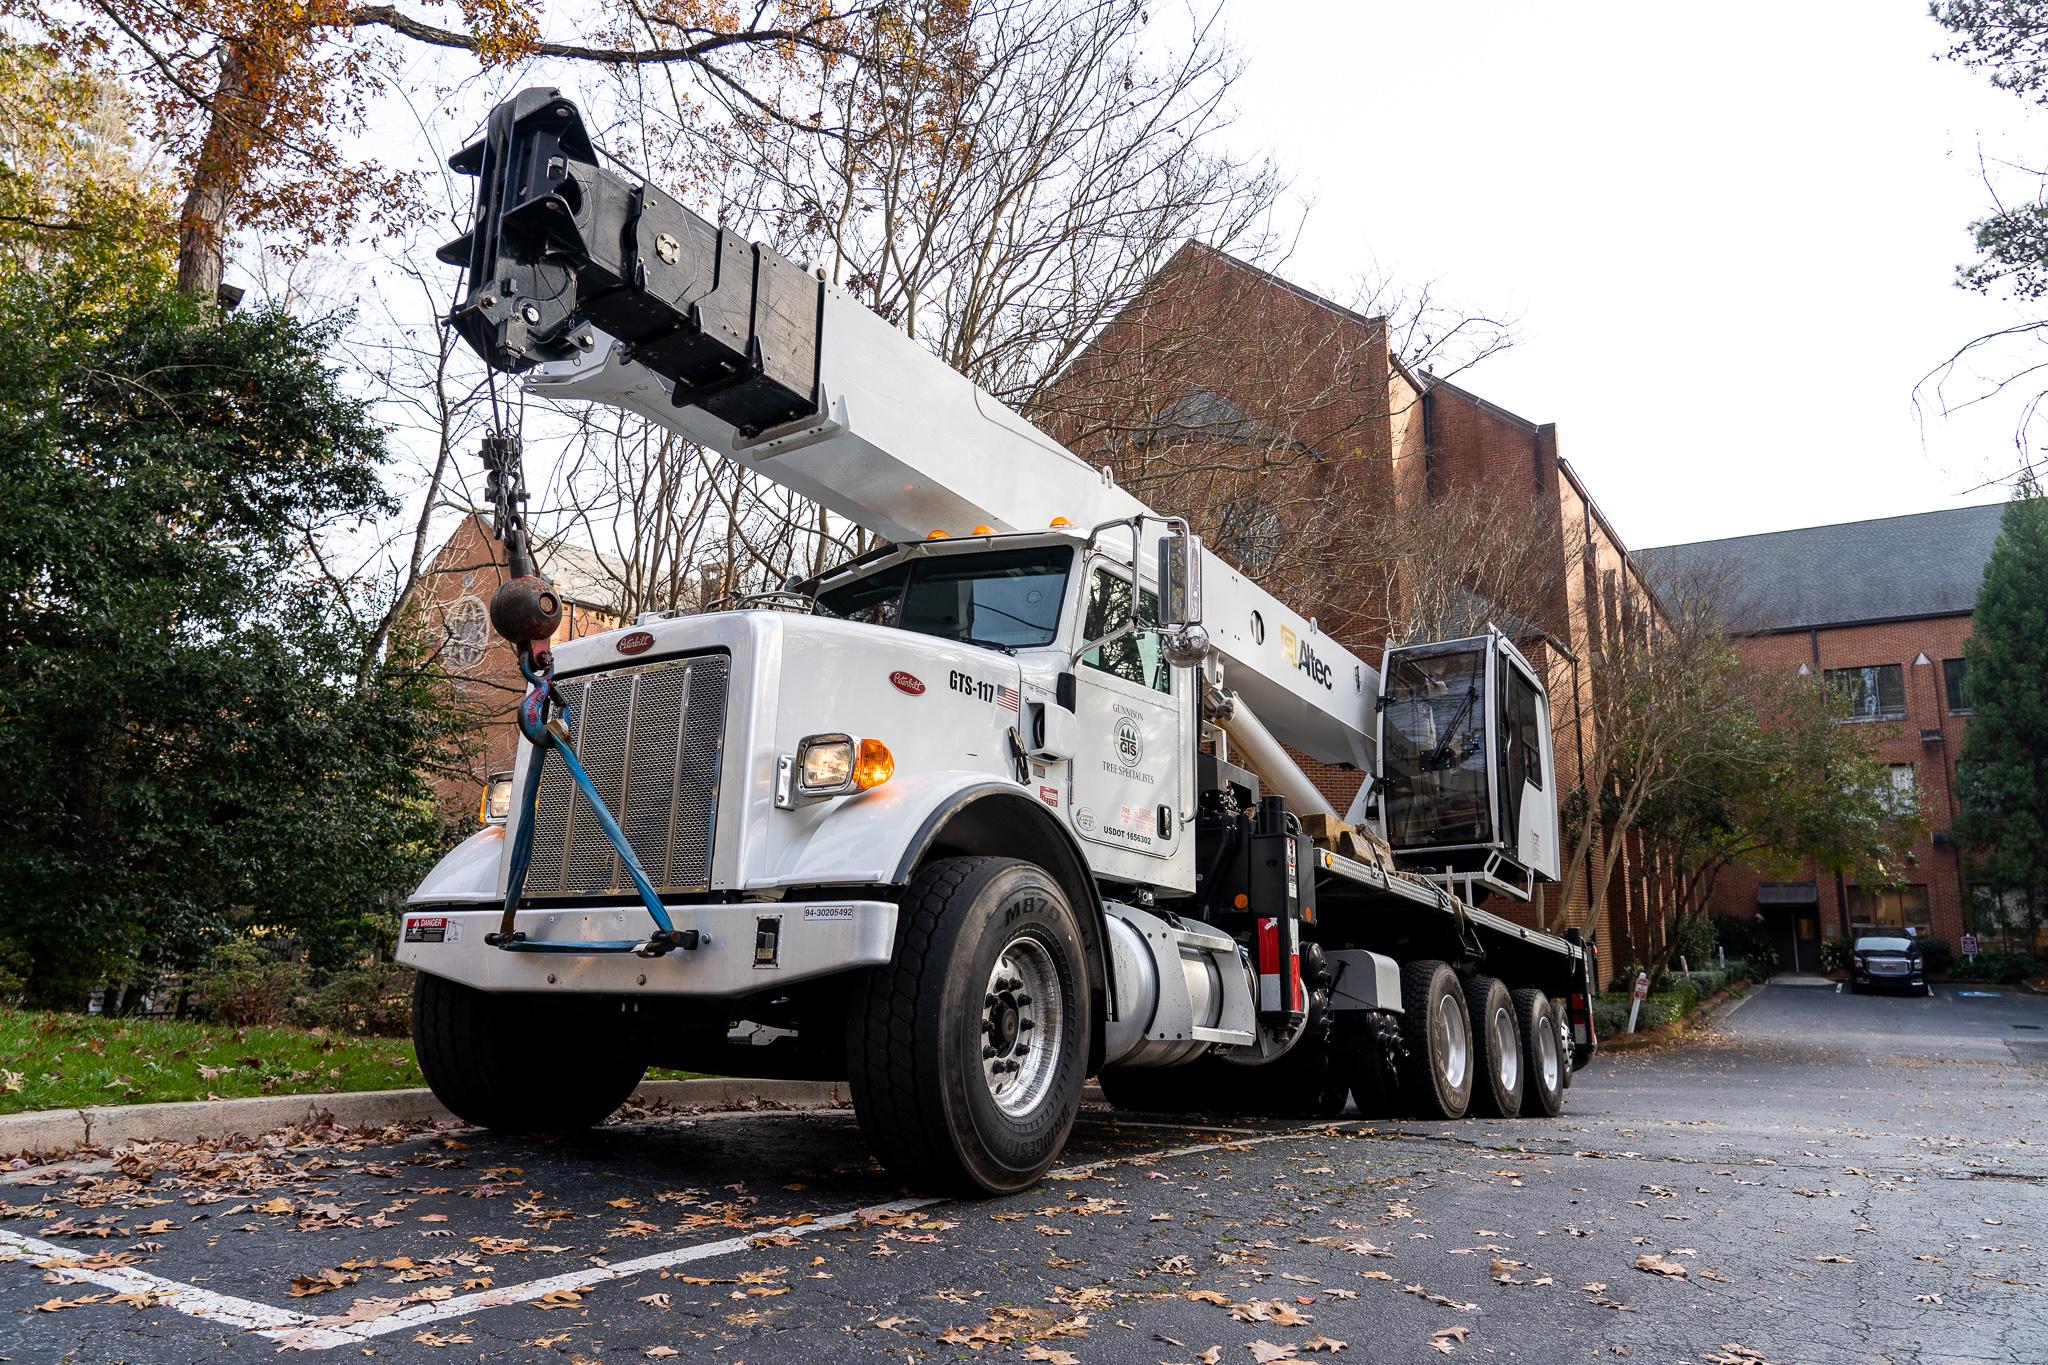 A Gunnison Tree Services truck